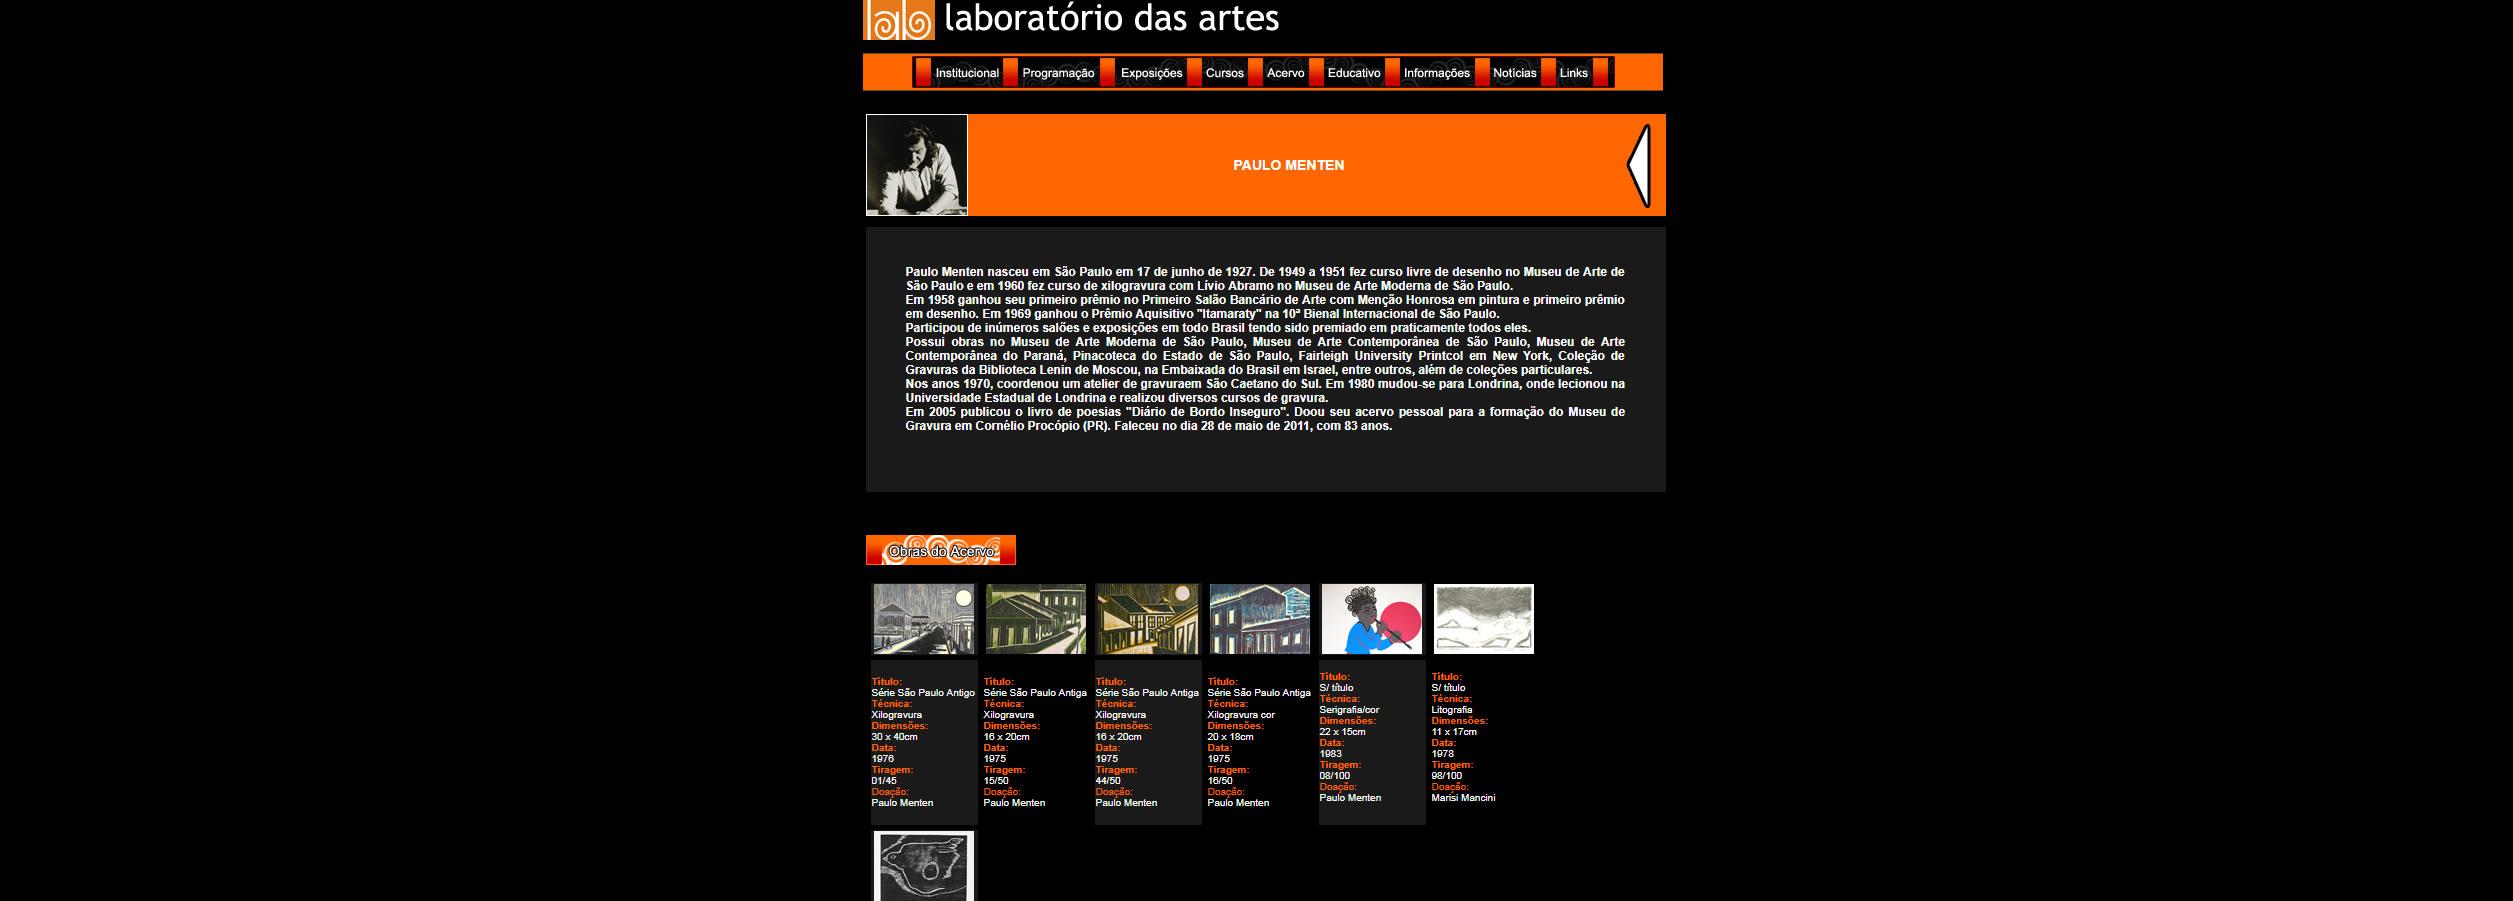 laboratorio_das_artes_galeria_de_gravura